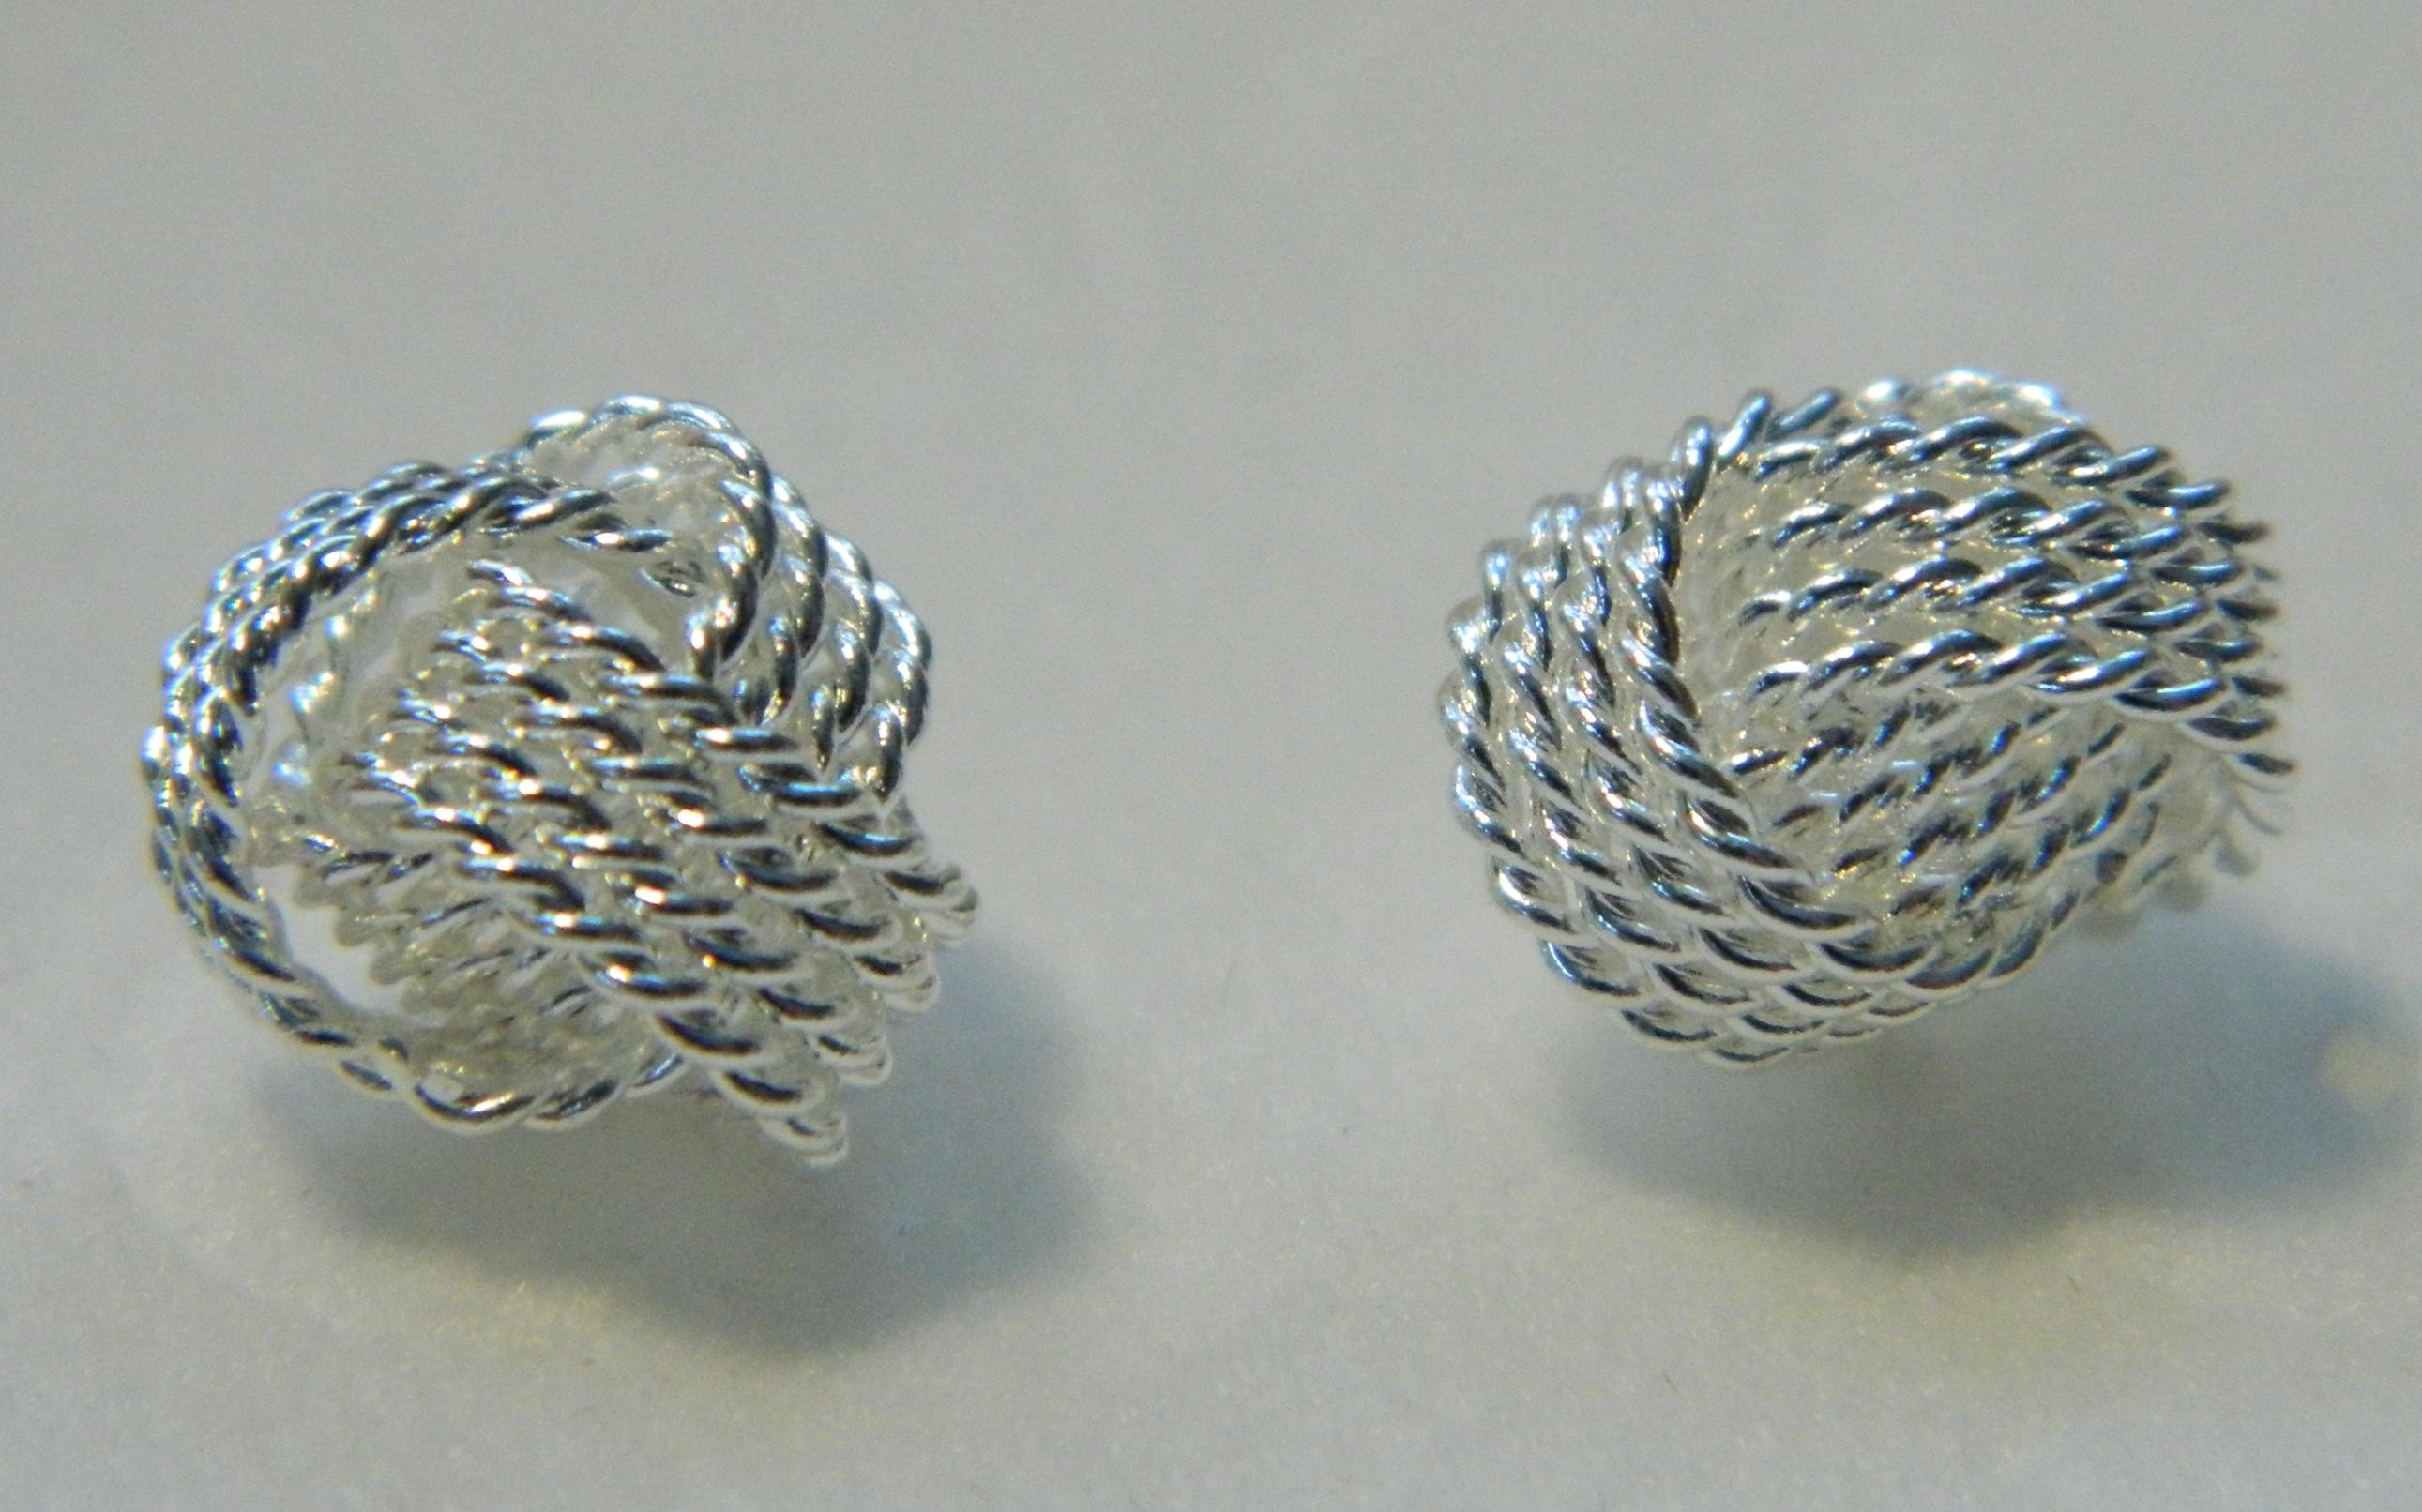 Silver Sailors Knot Earrings